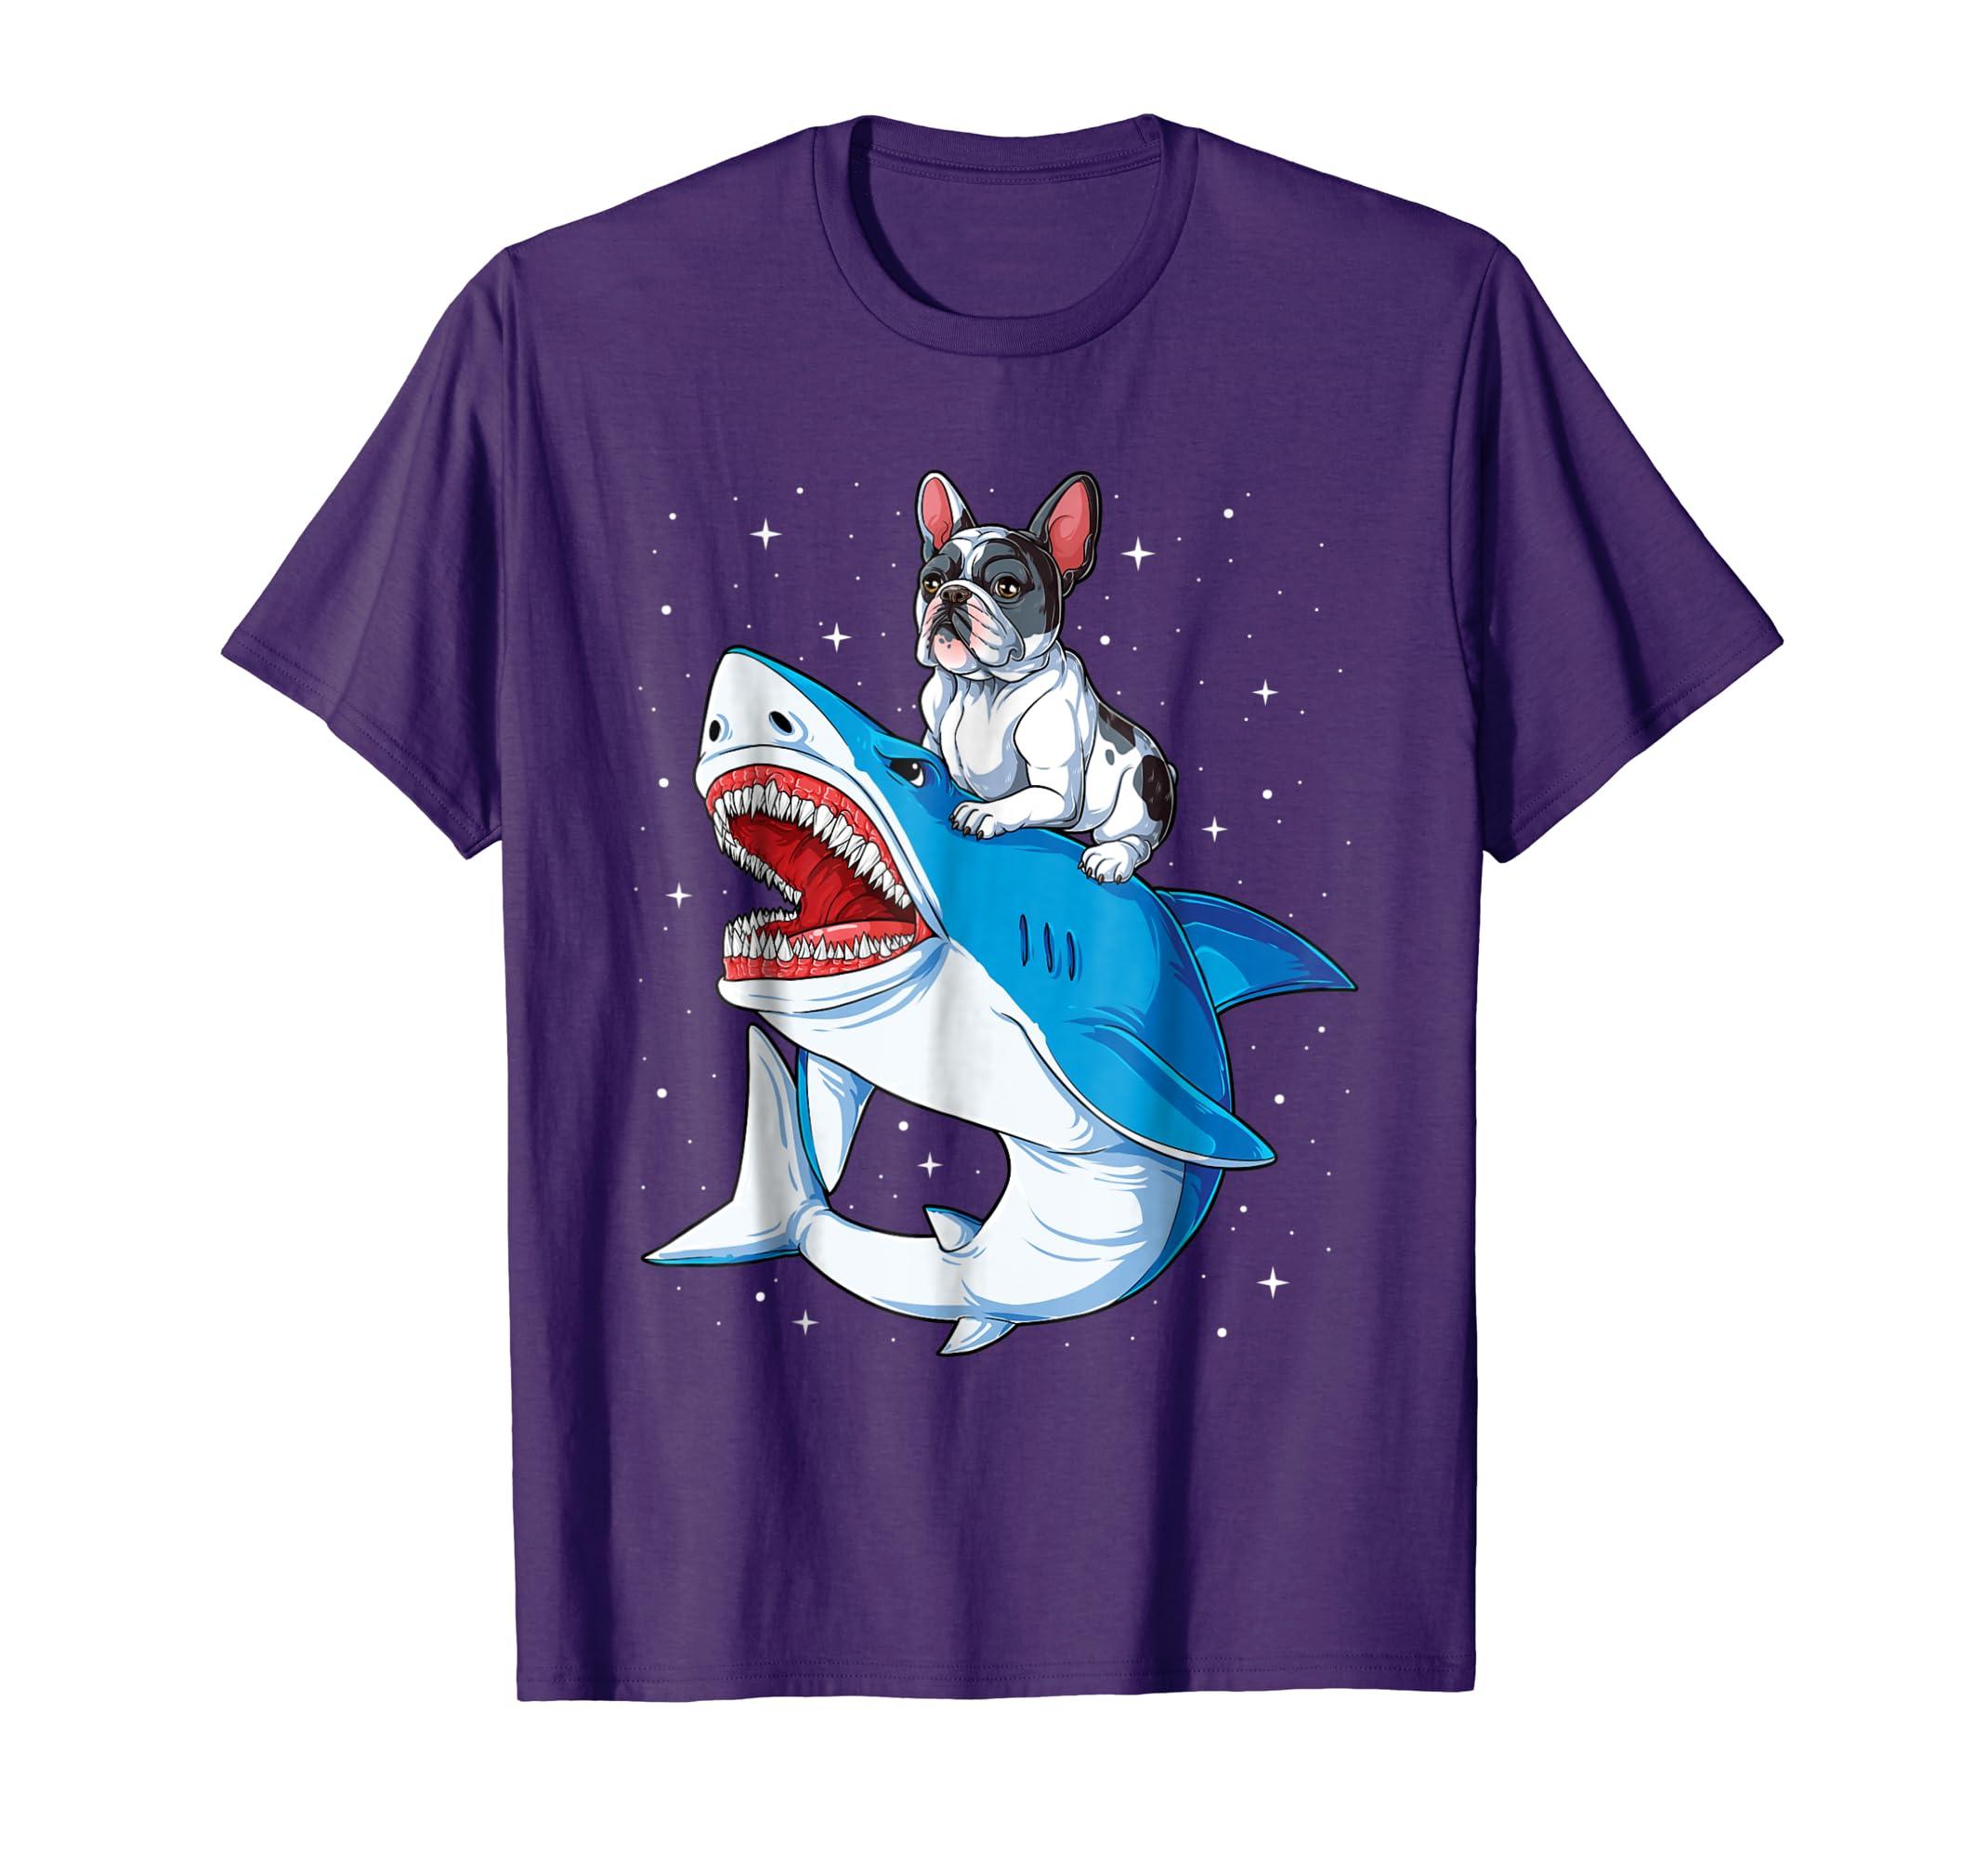 French Bulldog Shark T shirt Kids Men Space Galaxy Jawsome-azvn